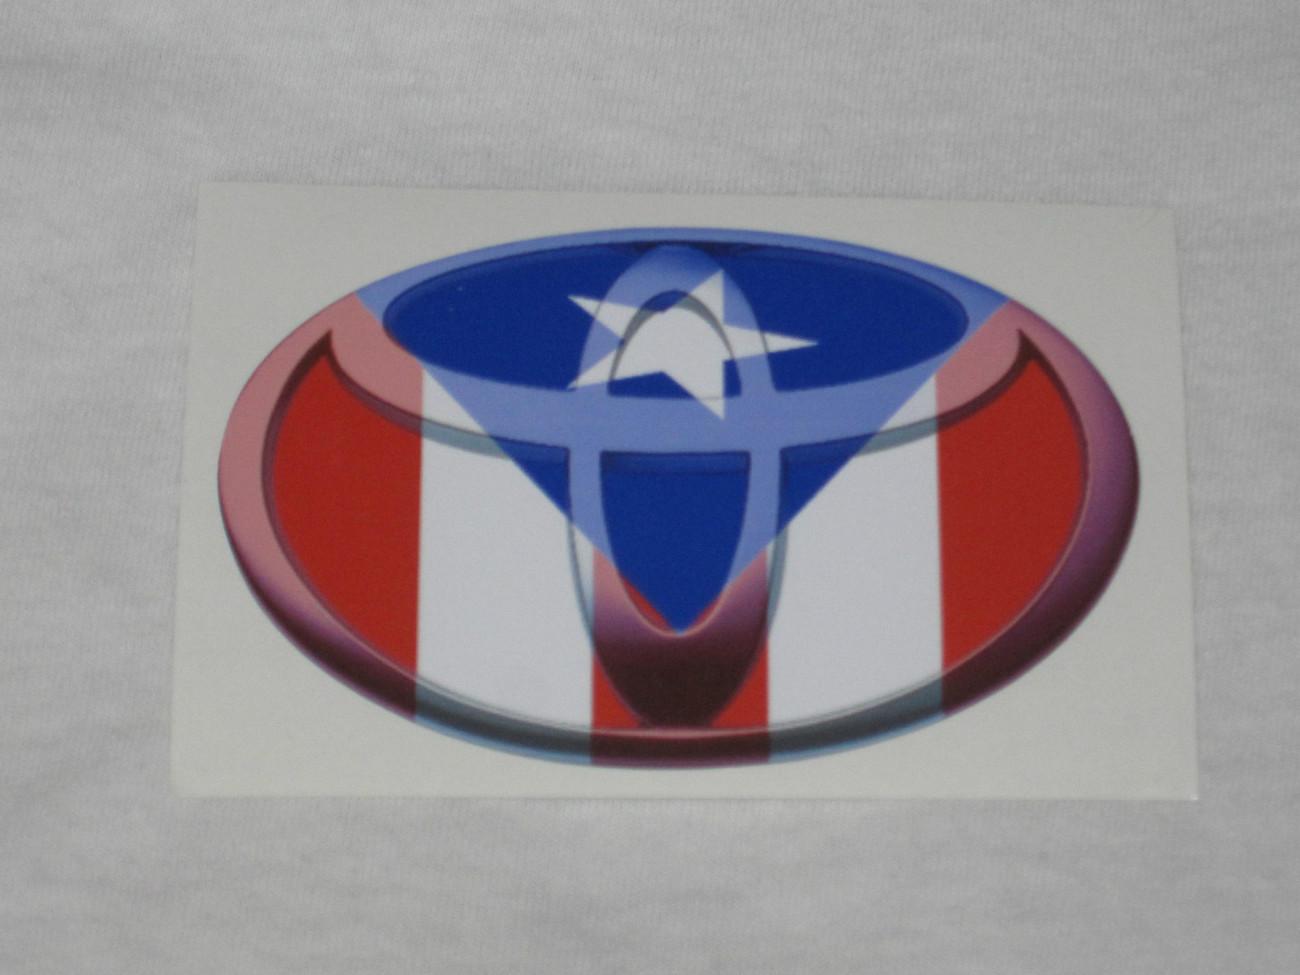 Toyota Sticker, Toyota Vinyl Sticker, Sticker, Toyota